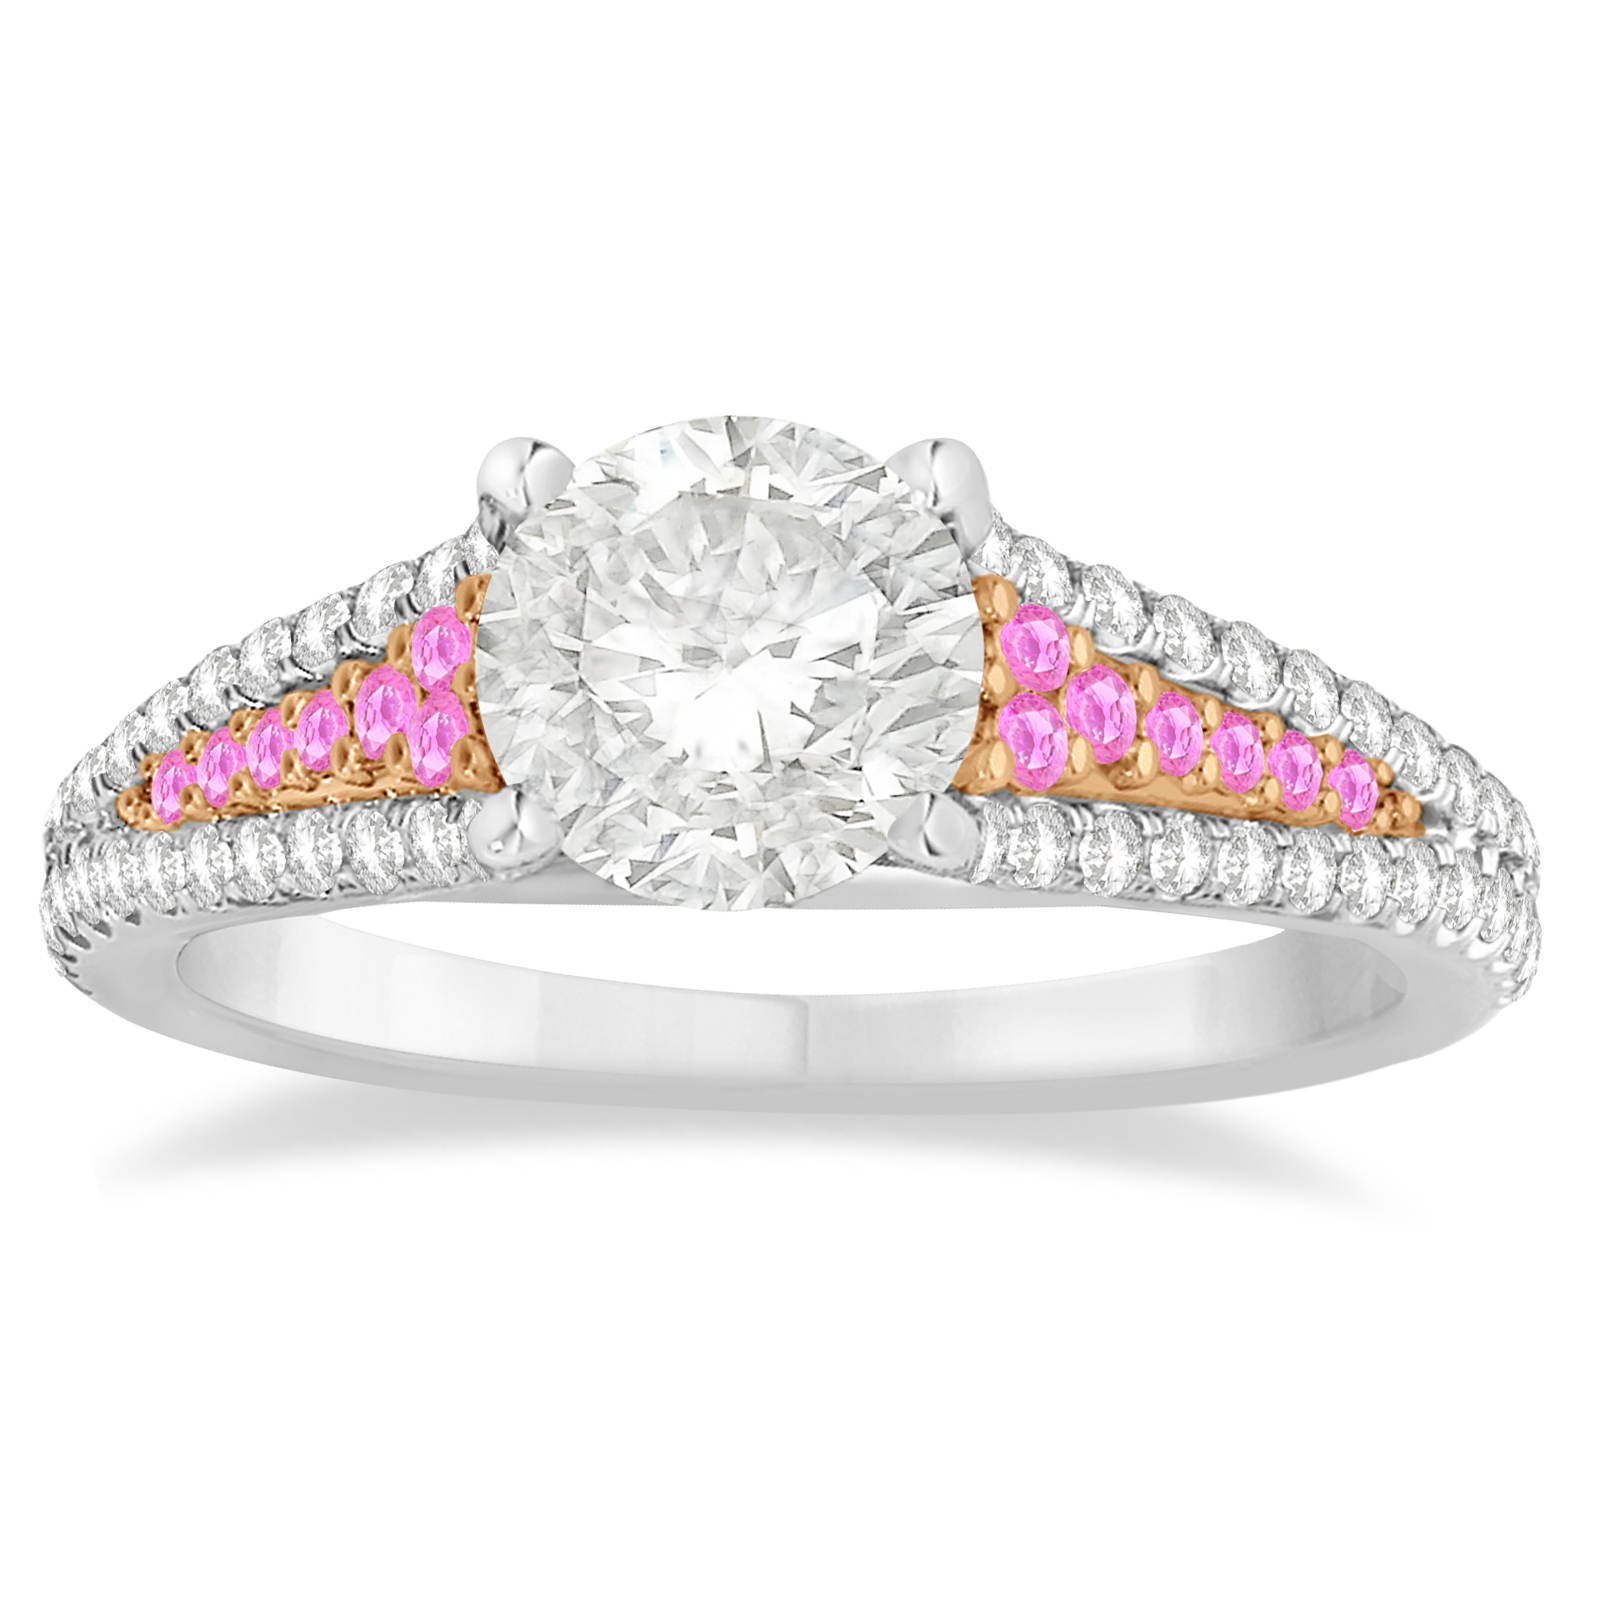 Pink Sapphire & Diamond Engagement Ring 14k Rose Gold 0 33ct Allurez